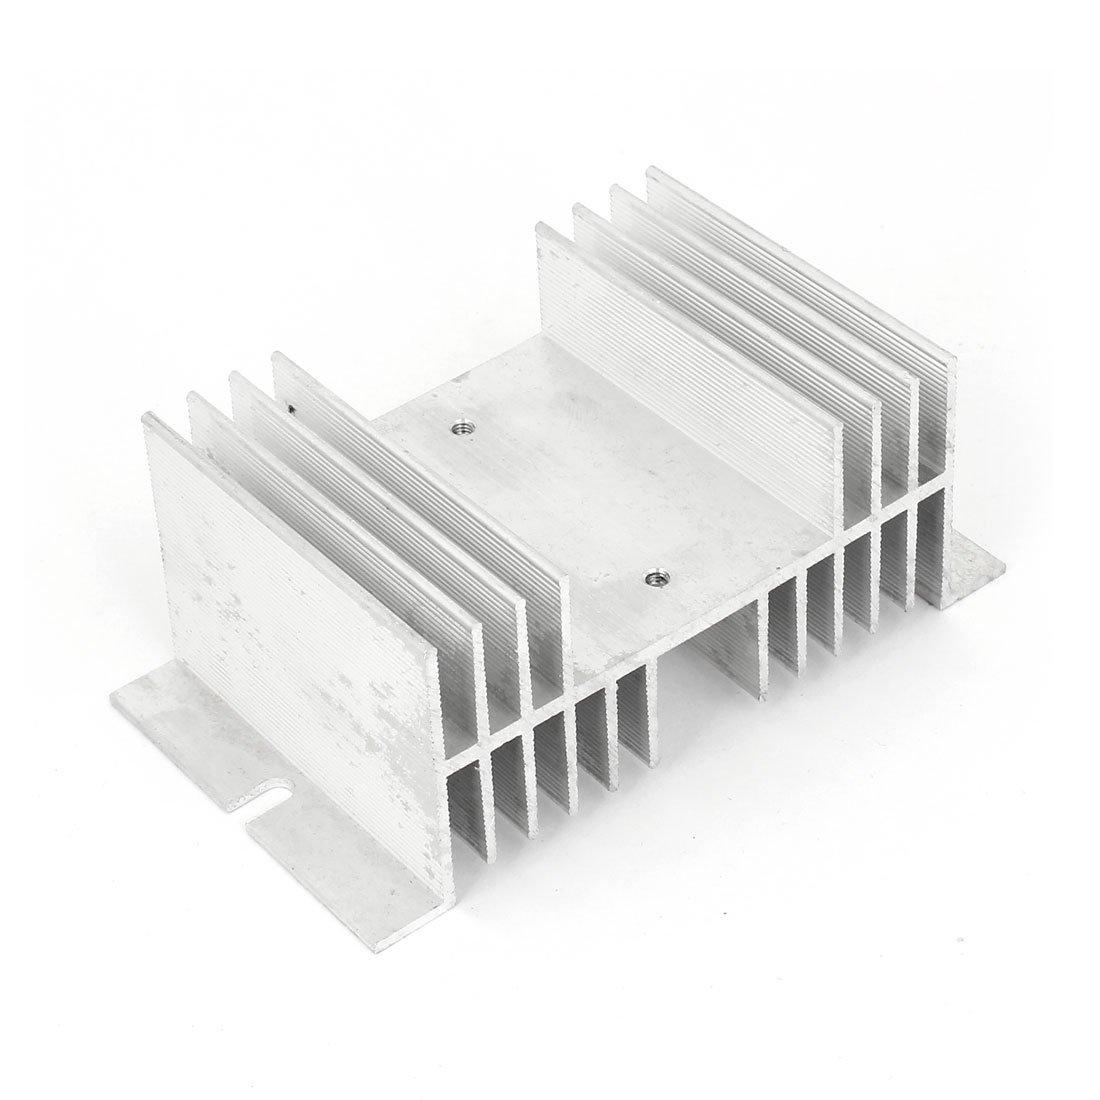 uxcell 126mm x 70mm x 50mm Aluminum Heat Solid State Relay Heatsink Cooler